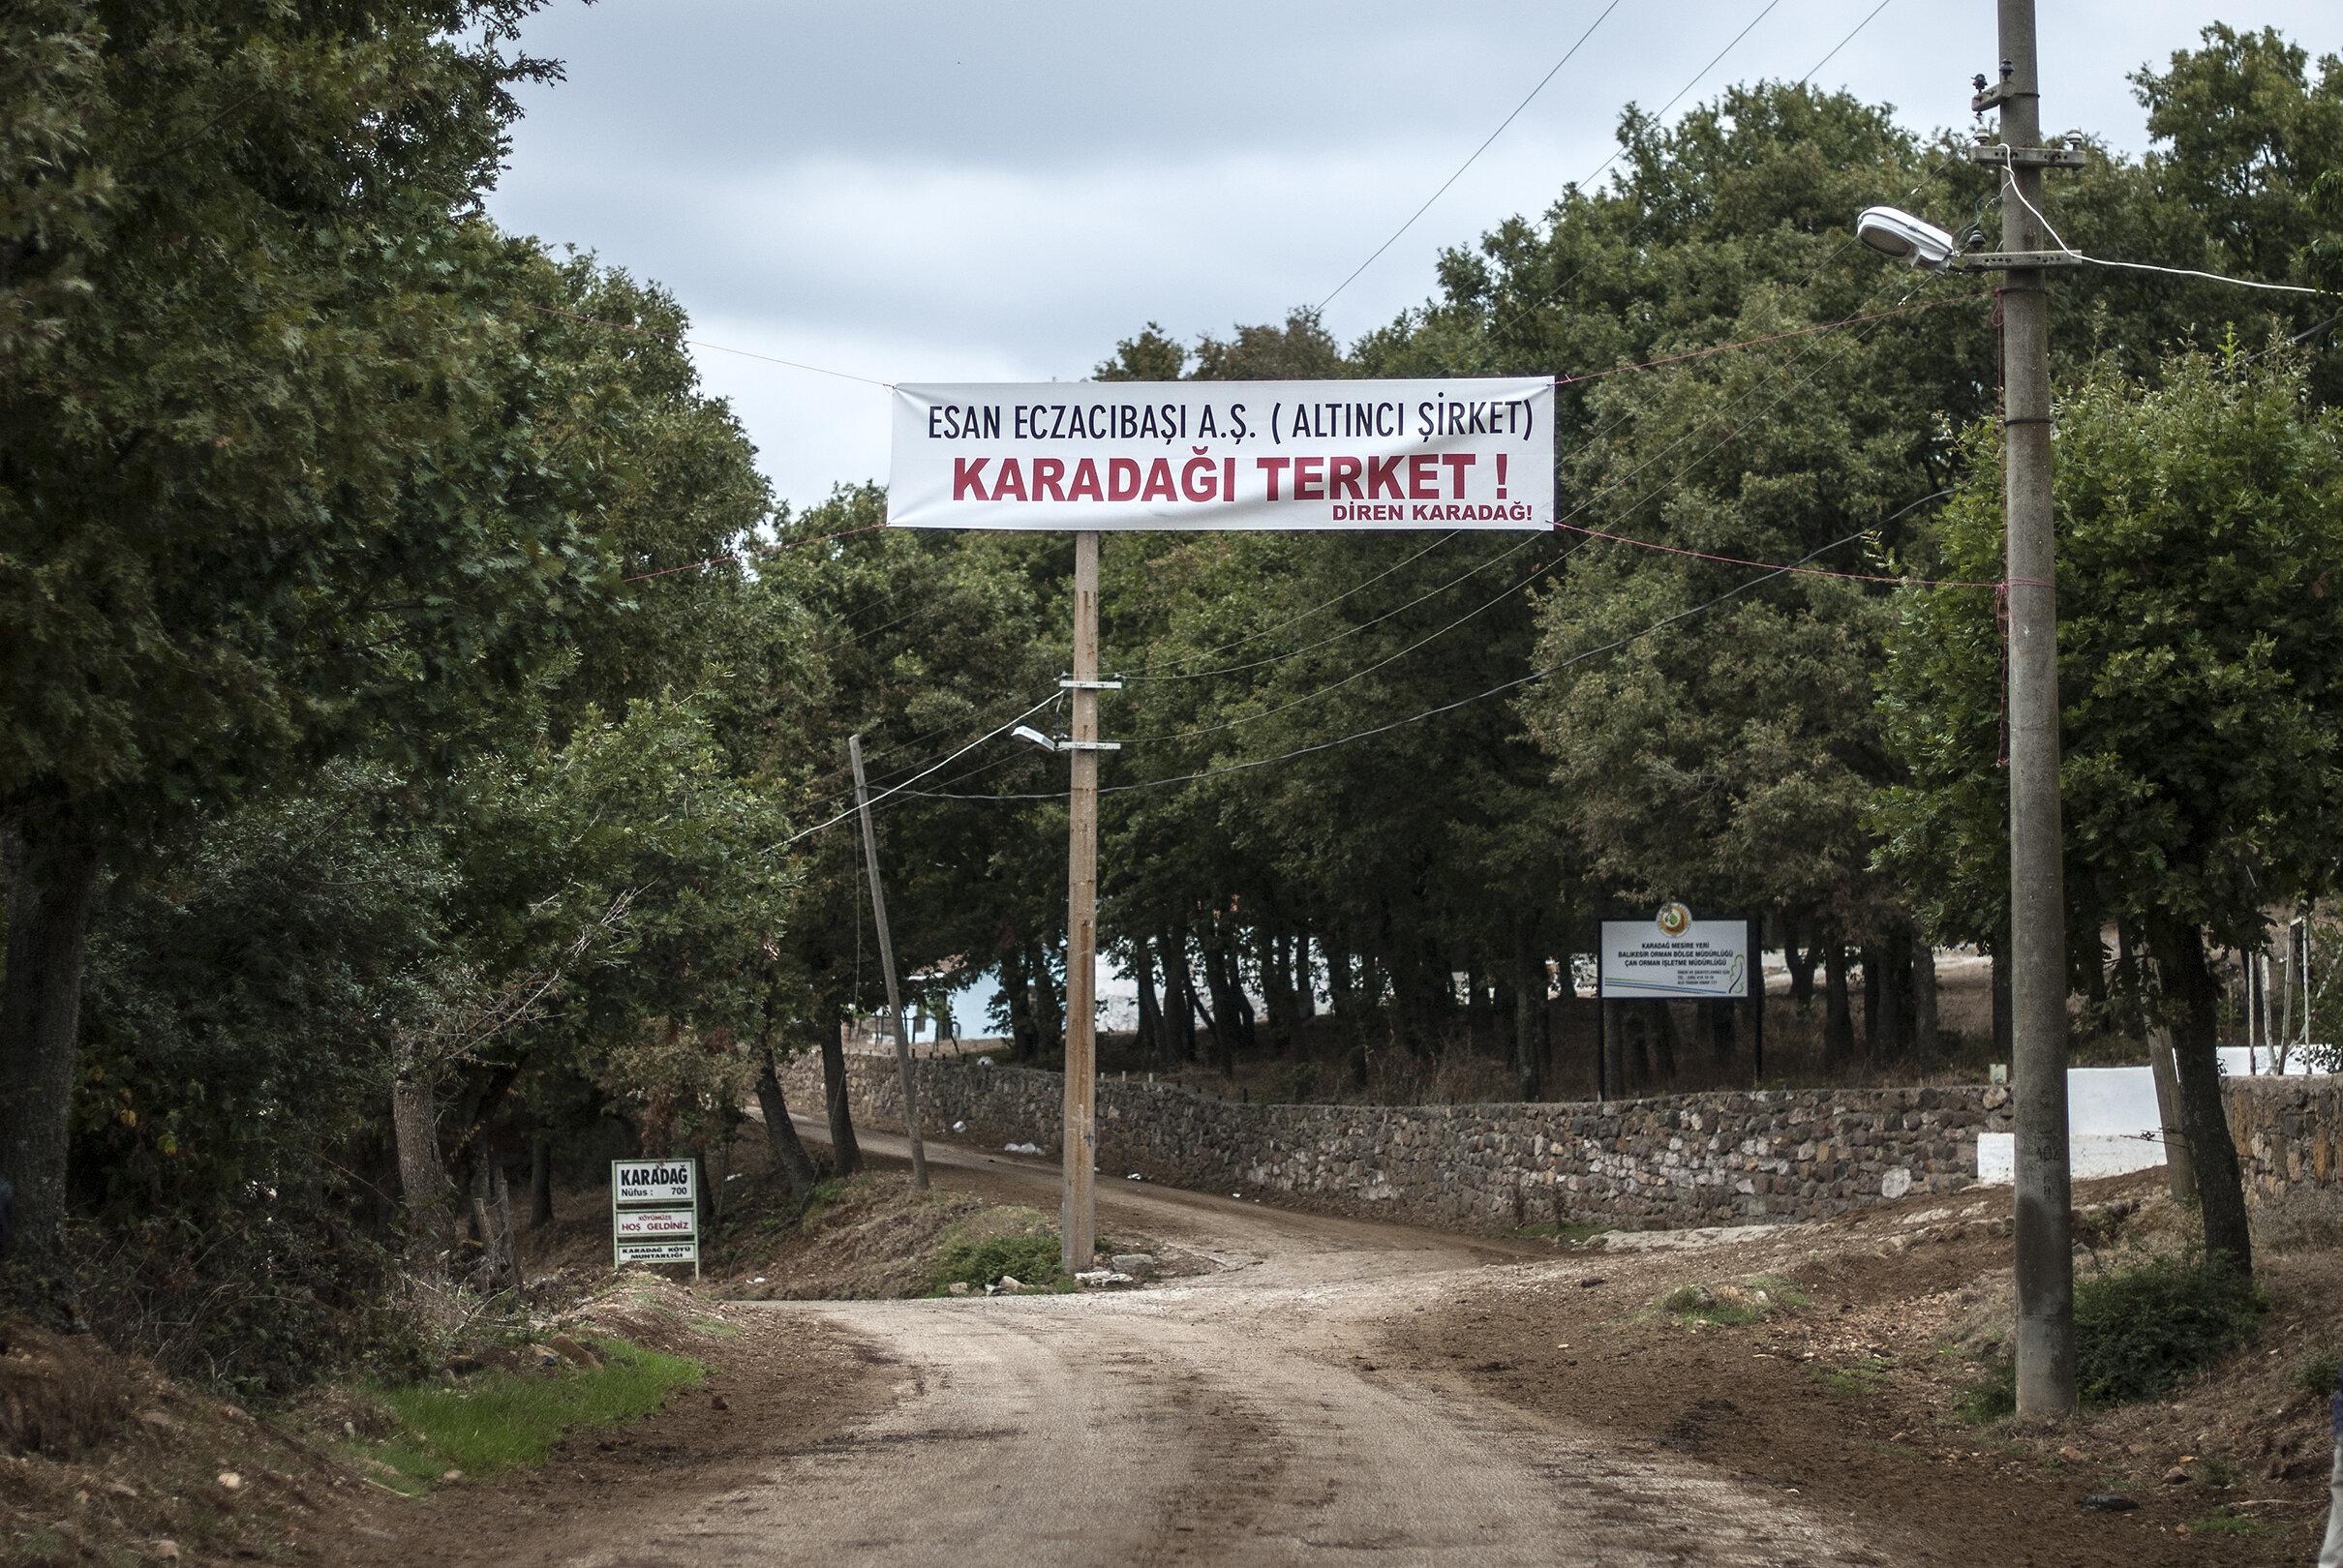 Views from protests in 2014 against Eczacıbaşı's mining activities in southwest Marmara (3/4) (courtesy of Aykan Özener)